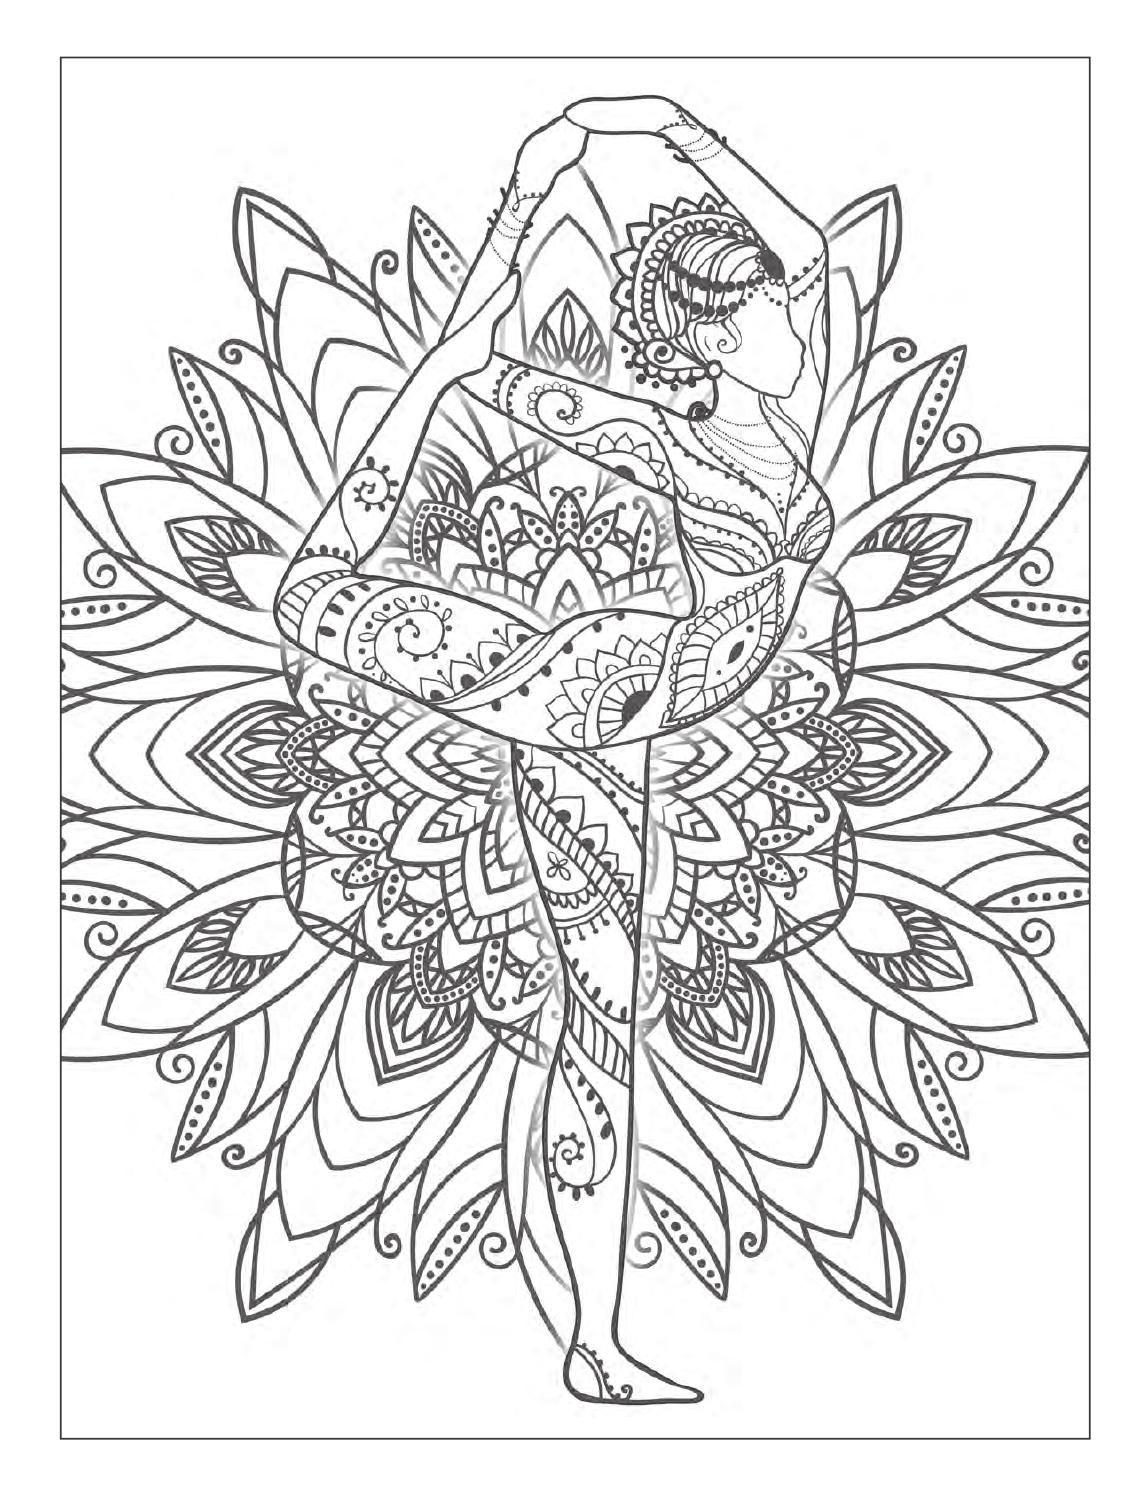 Yoga And Meditation Coloring Book For Adults With Yoga Poses And Mandalas Mandala Coloring Pages Designs Coloring Books Coloring Pages